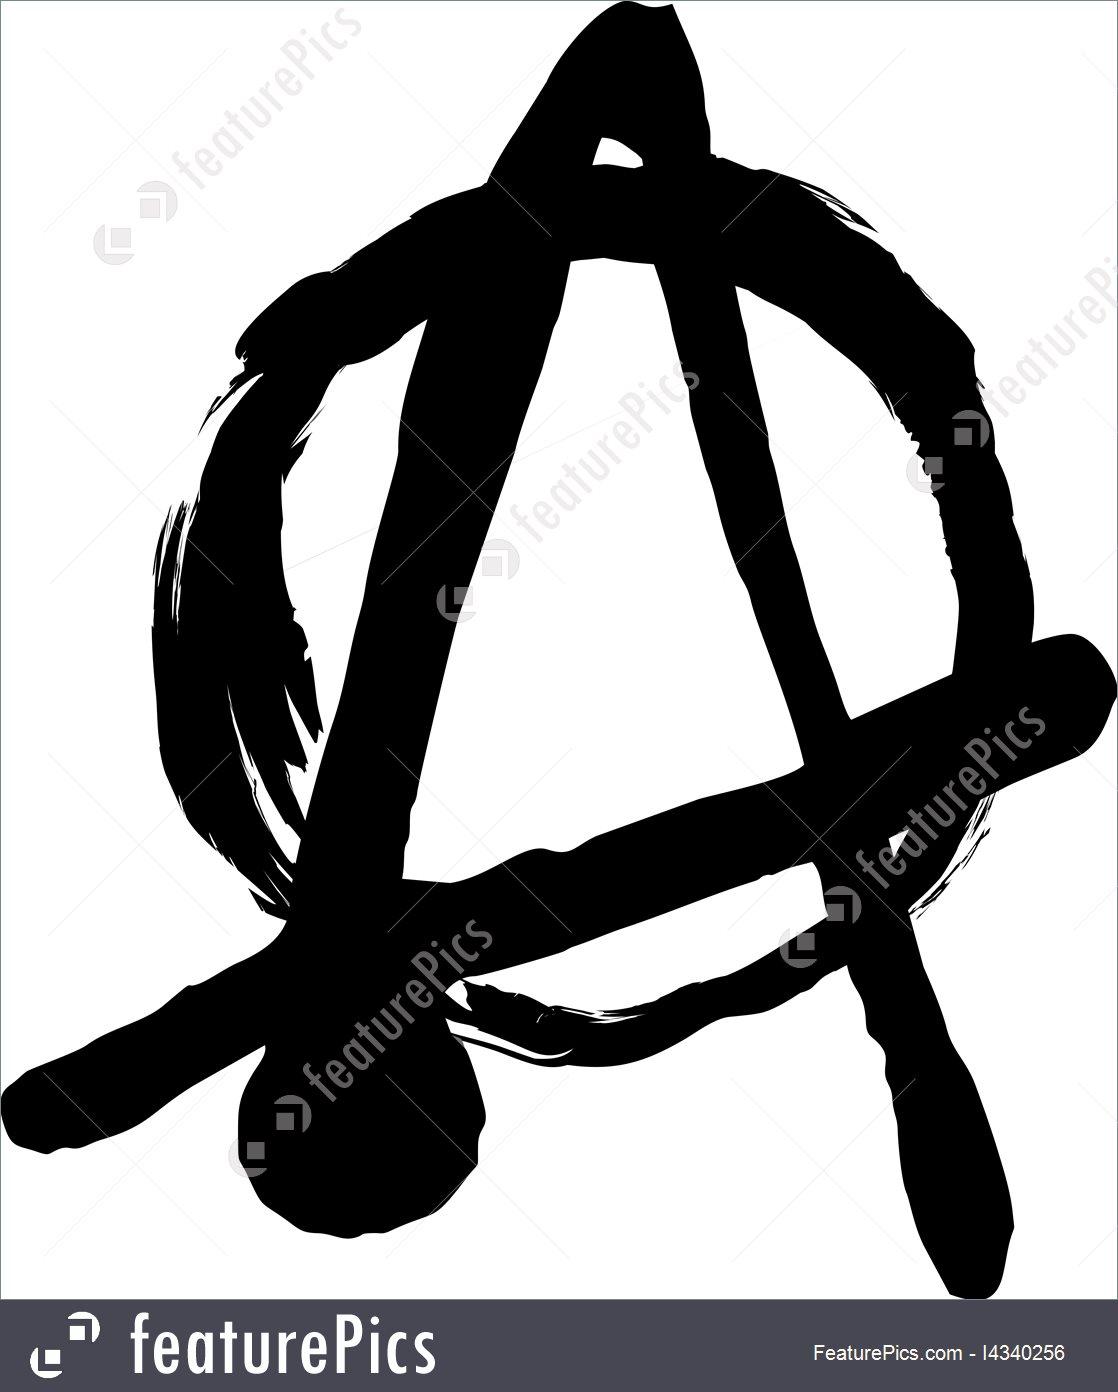 1118x1392 Anarchy Symbol Illustration